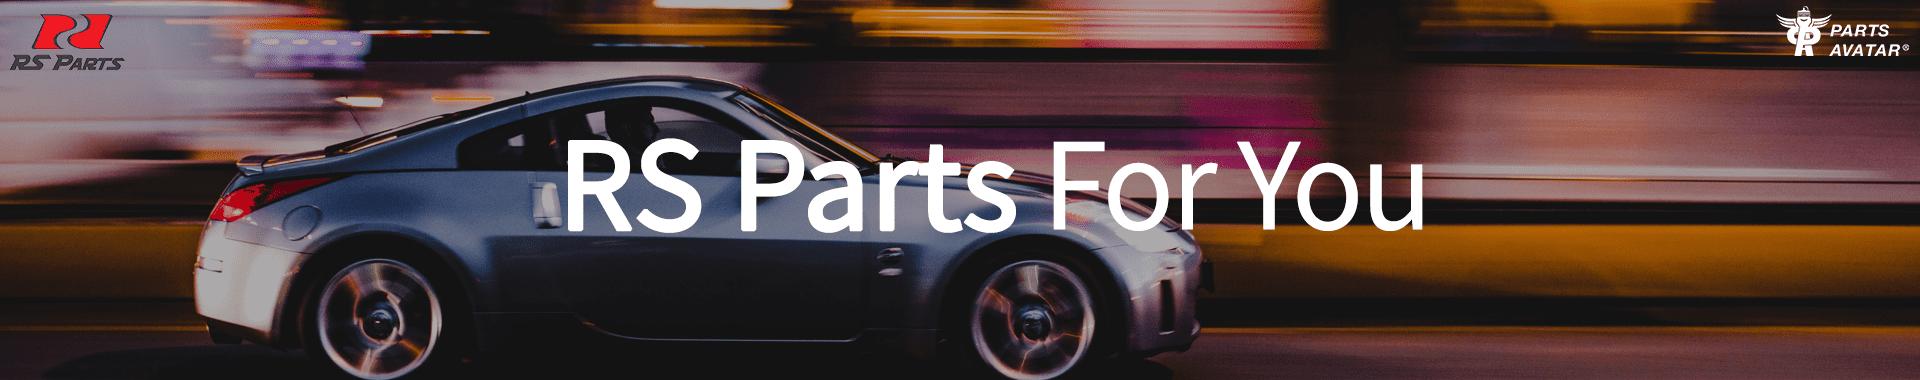 3.4. RS Parts Disc Brake Rotors